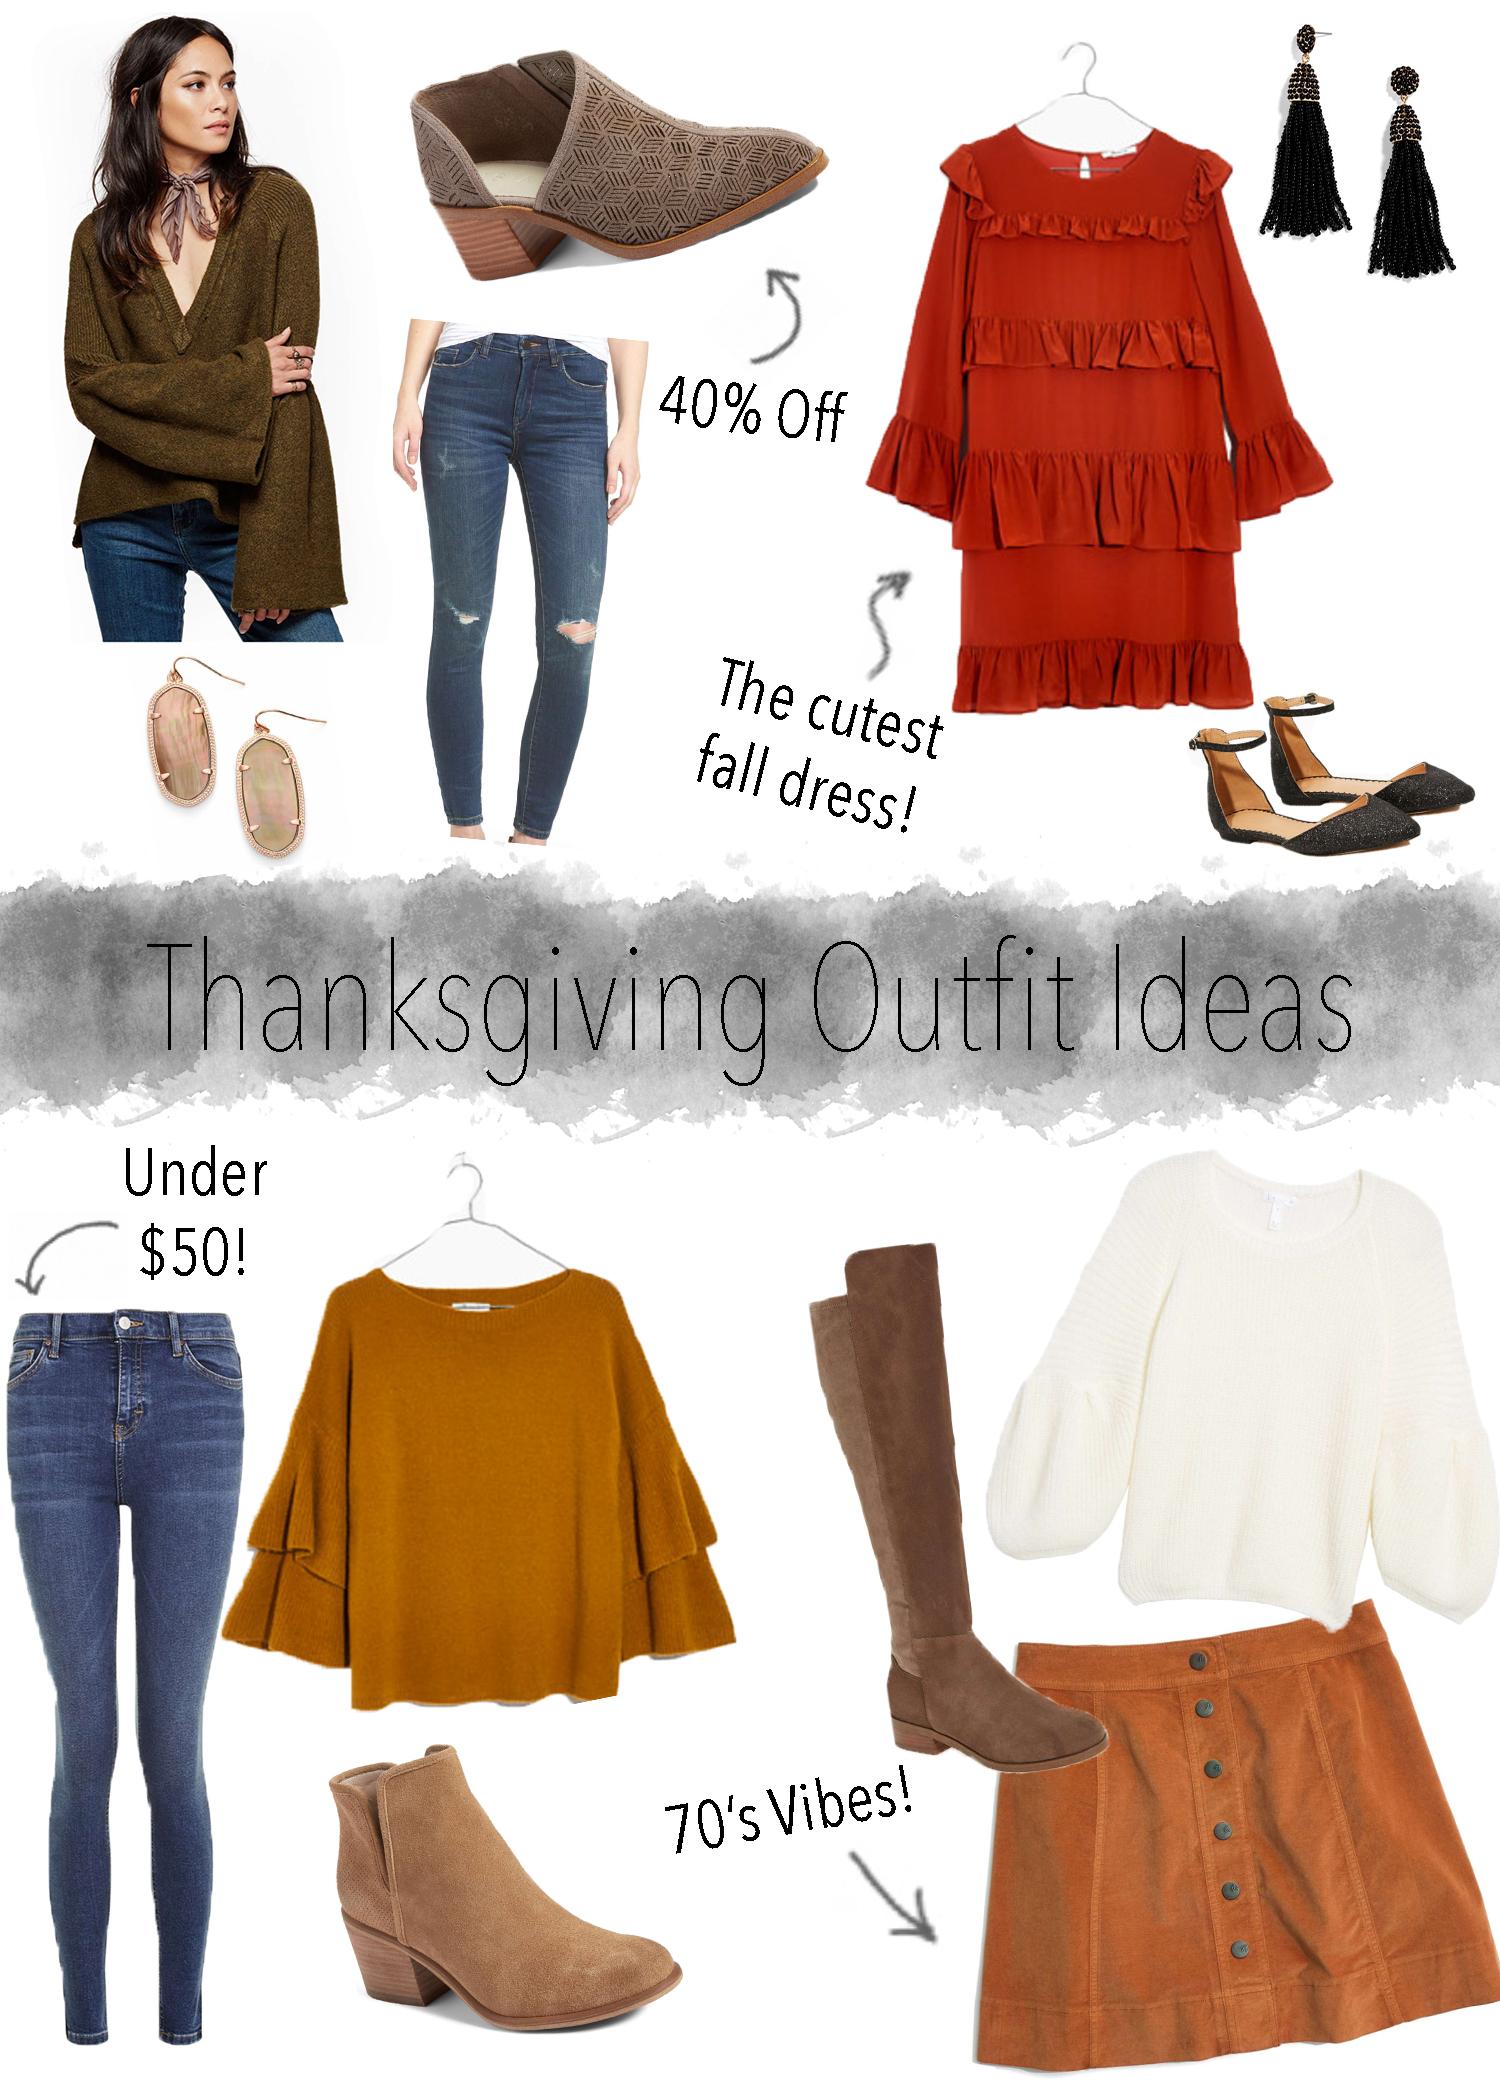 thanksgivingoutfits17.jpg